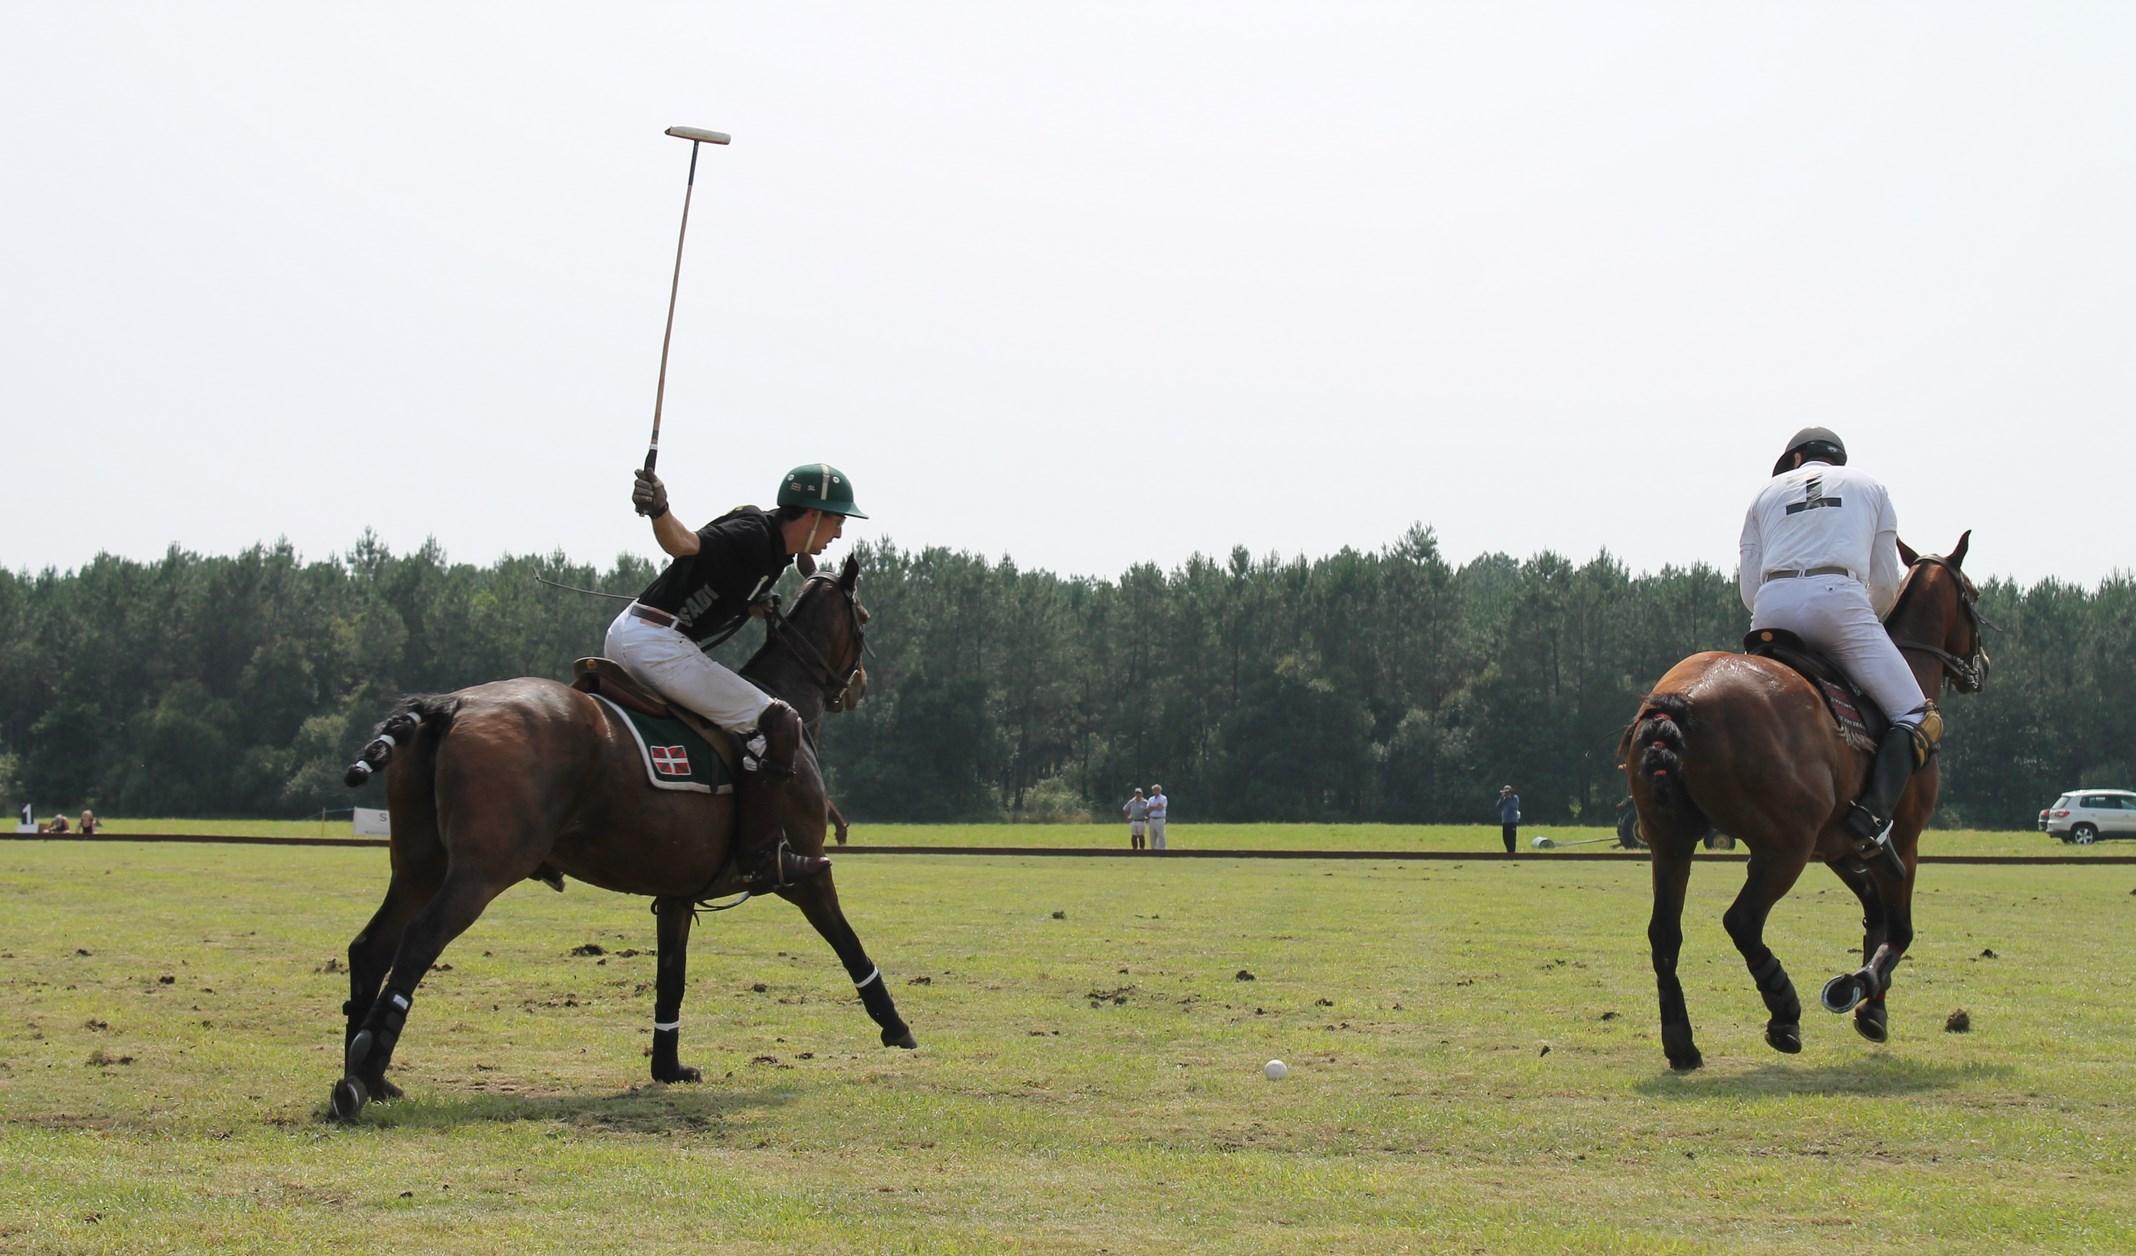 Un cavalier biarrot armant son tir (crédit: Yanik)